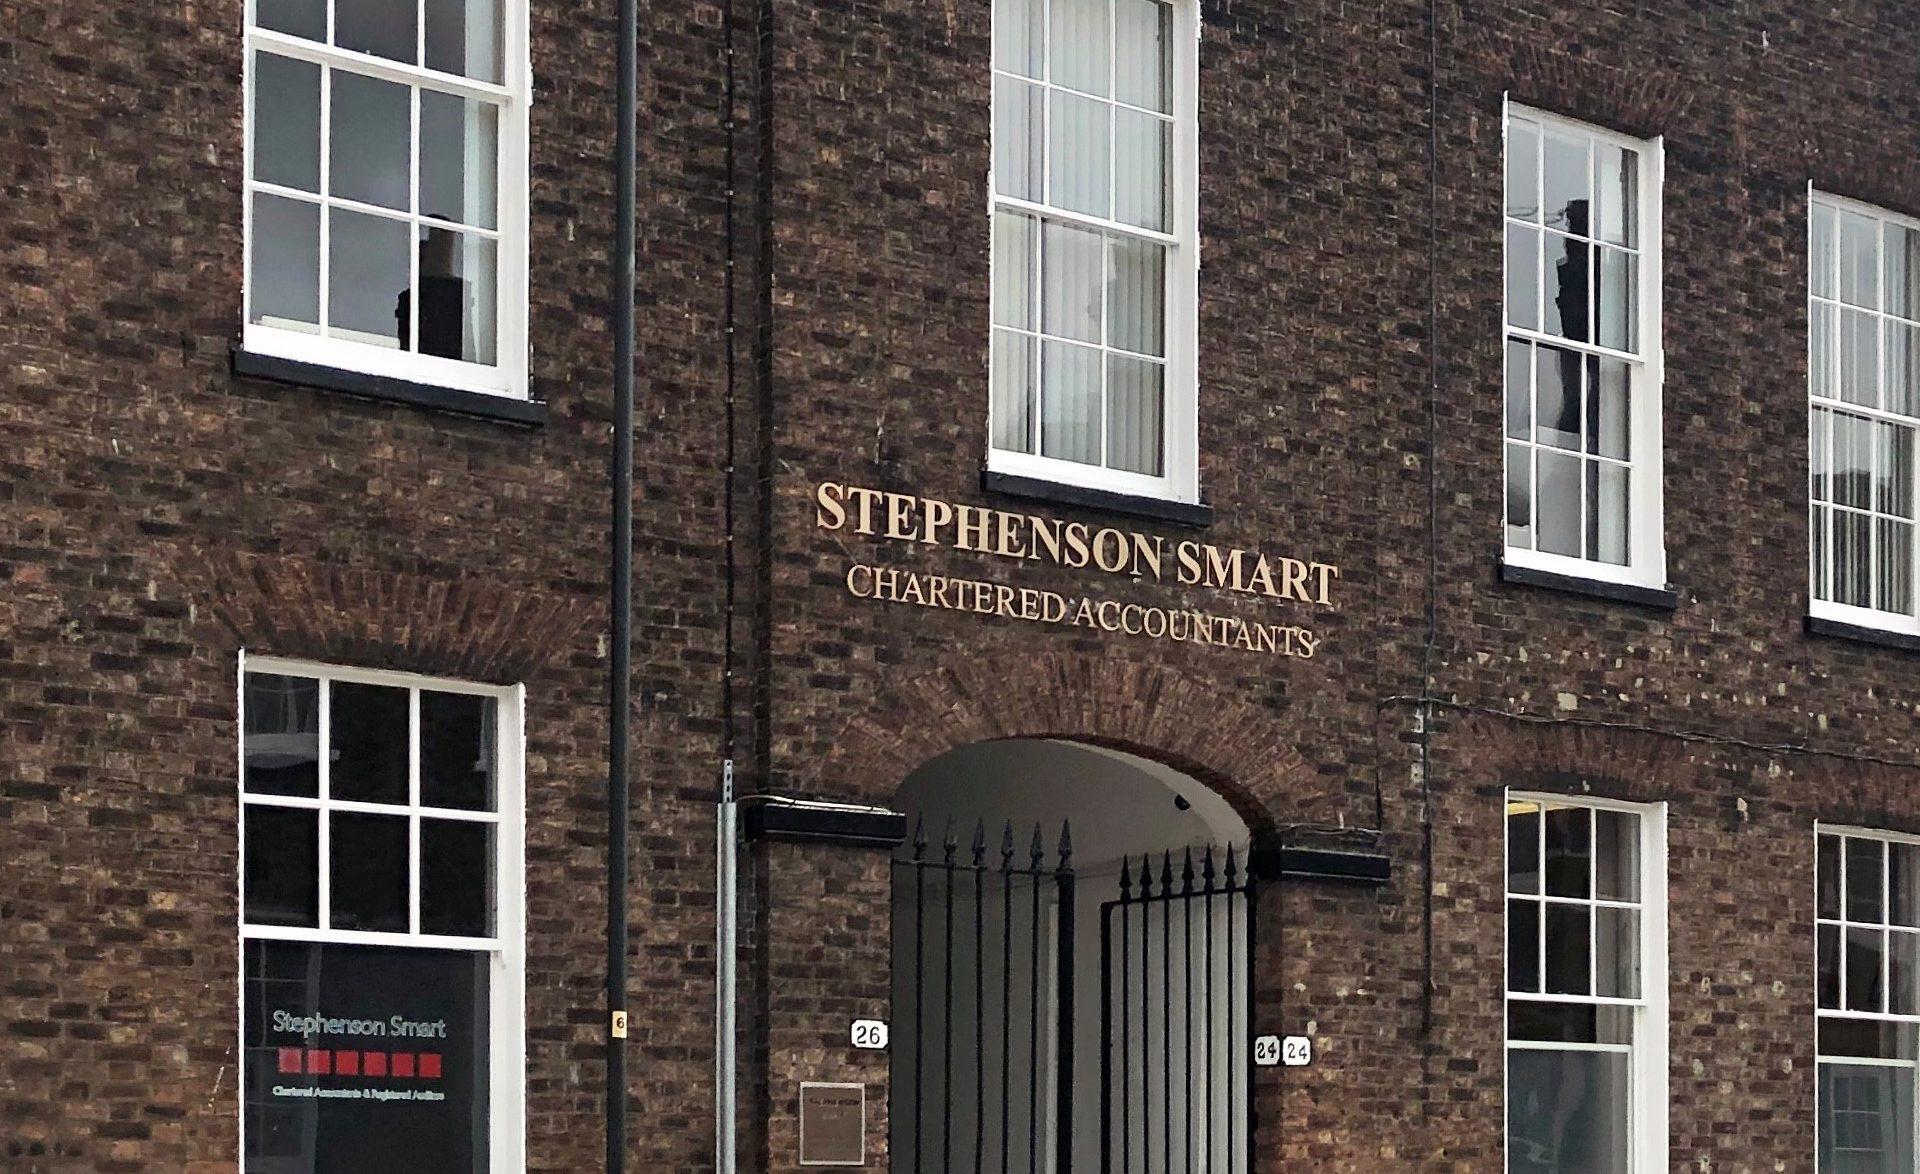 Stephenson Smart: King's Lynn Office